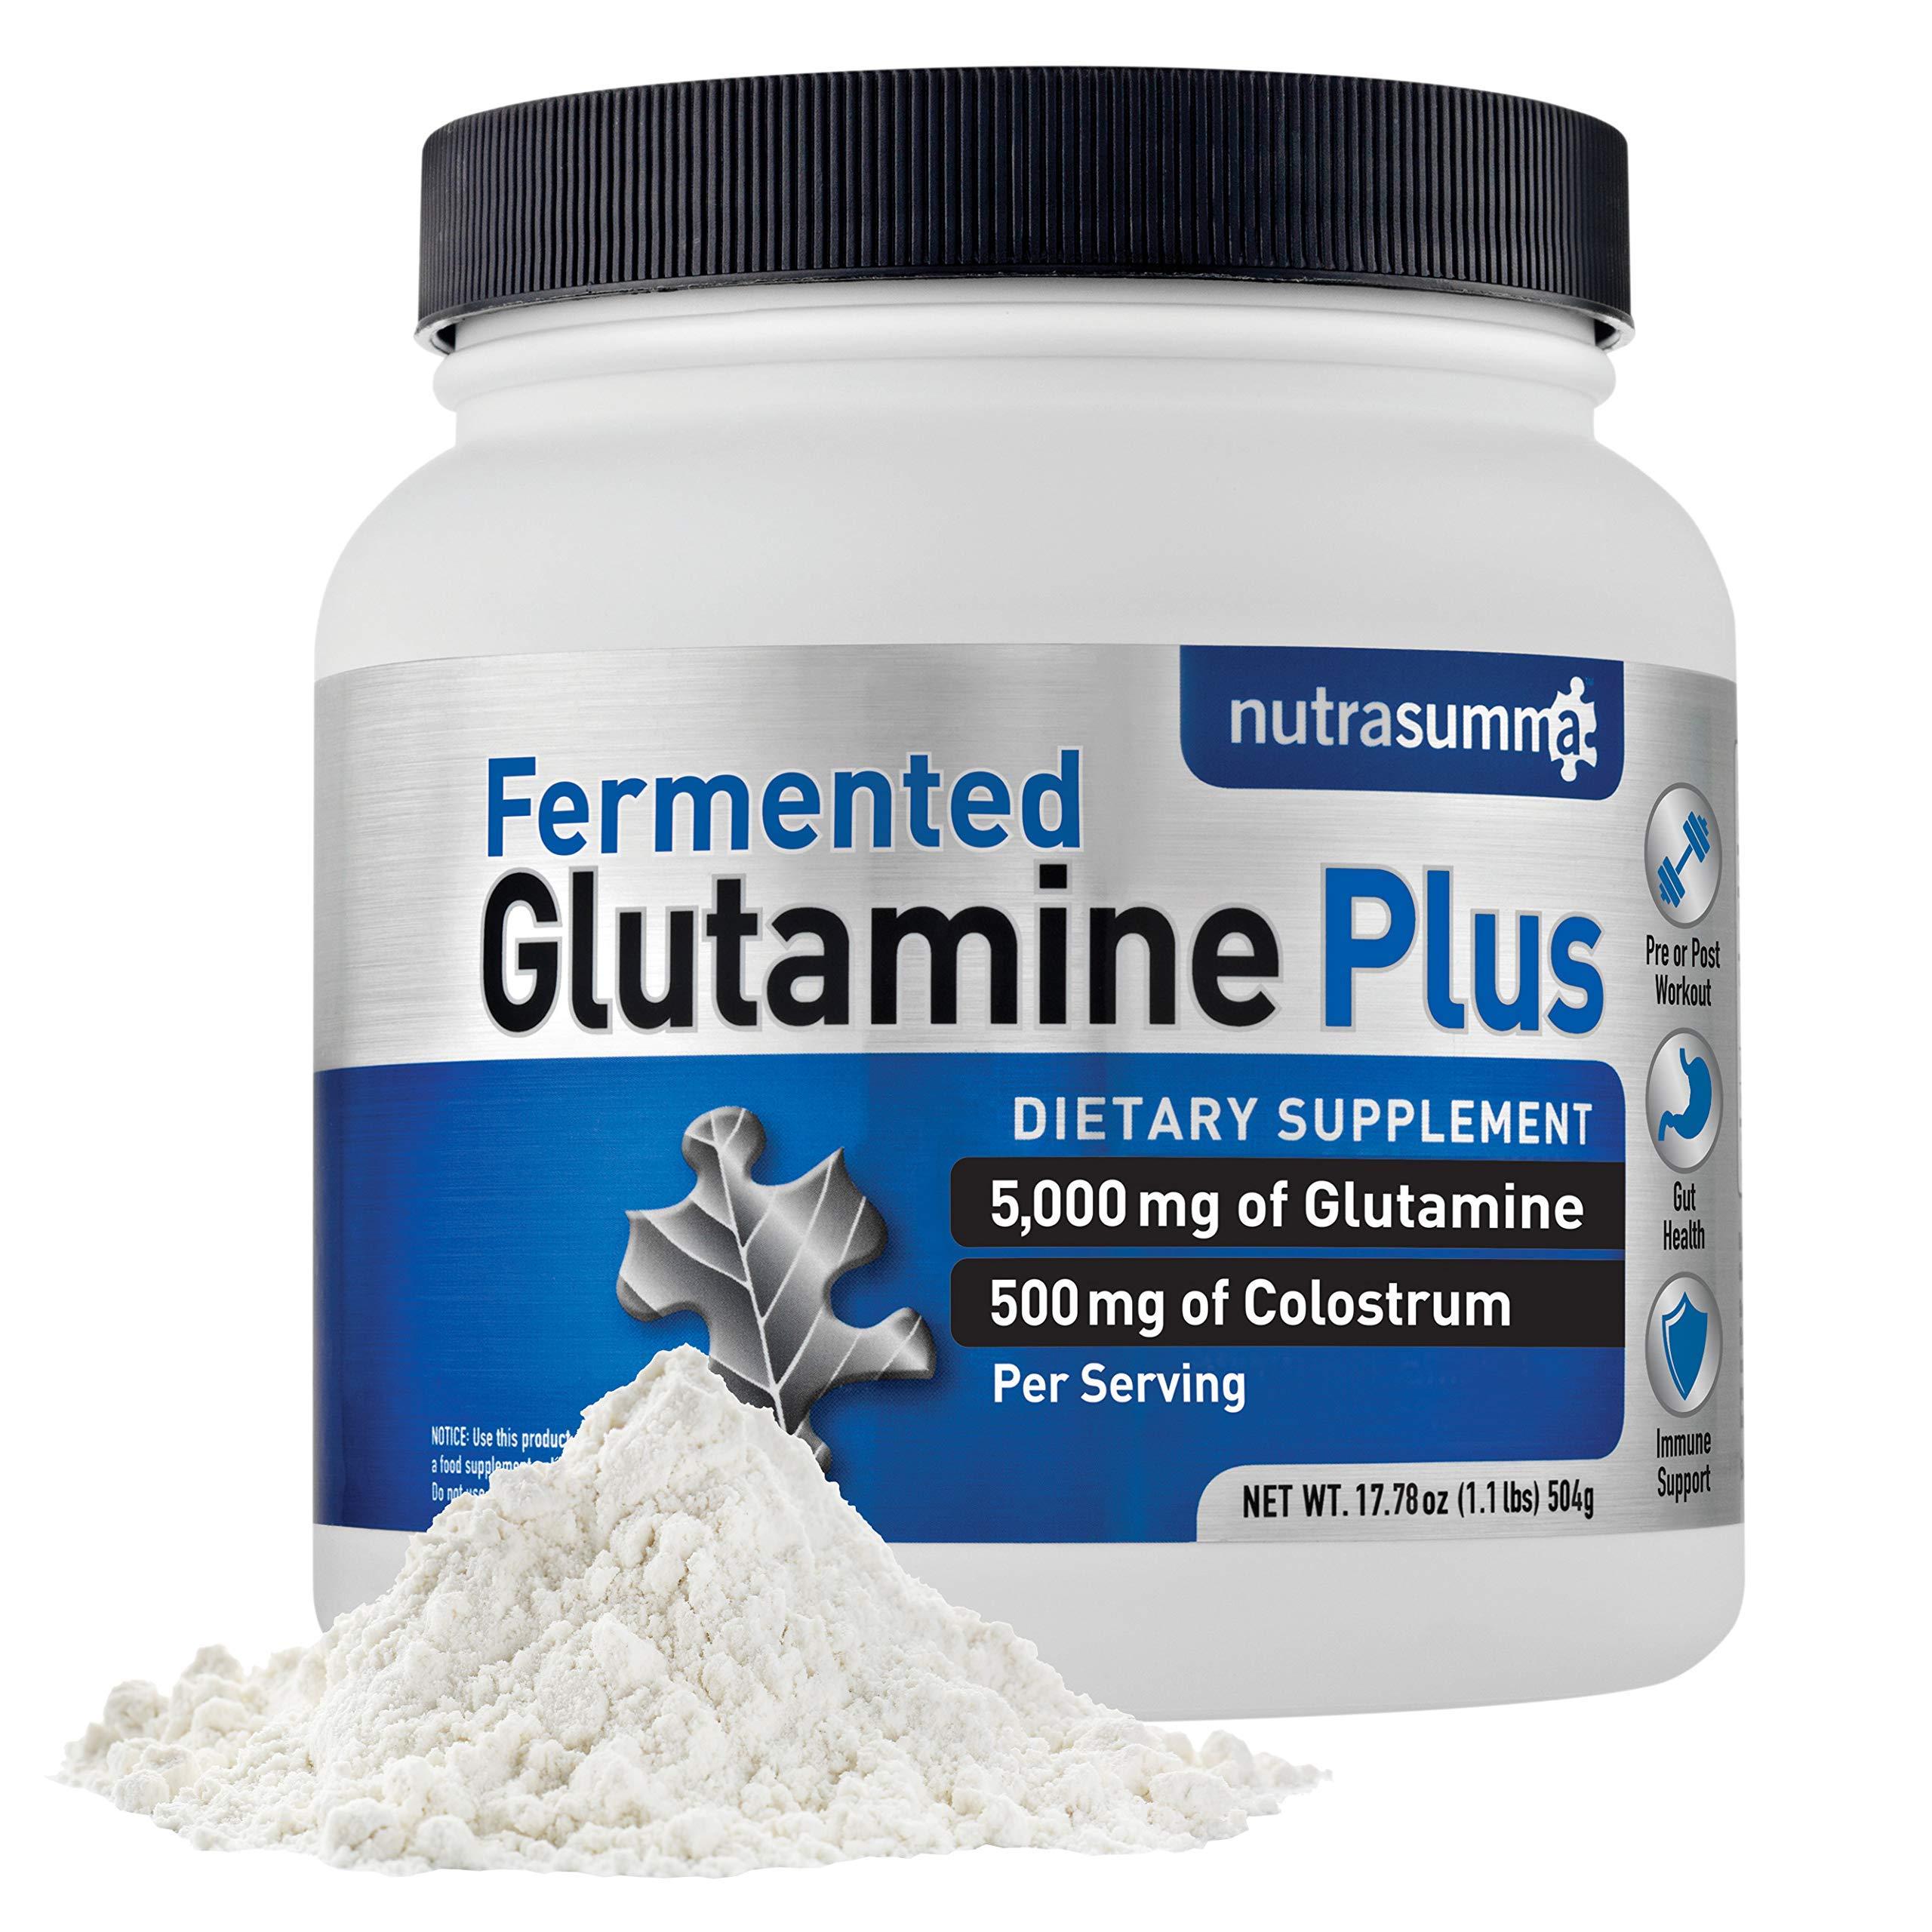 Nutrasumma Glutamine Plus 1.1 lb by Nutrasumma